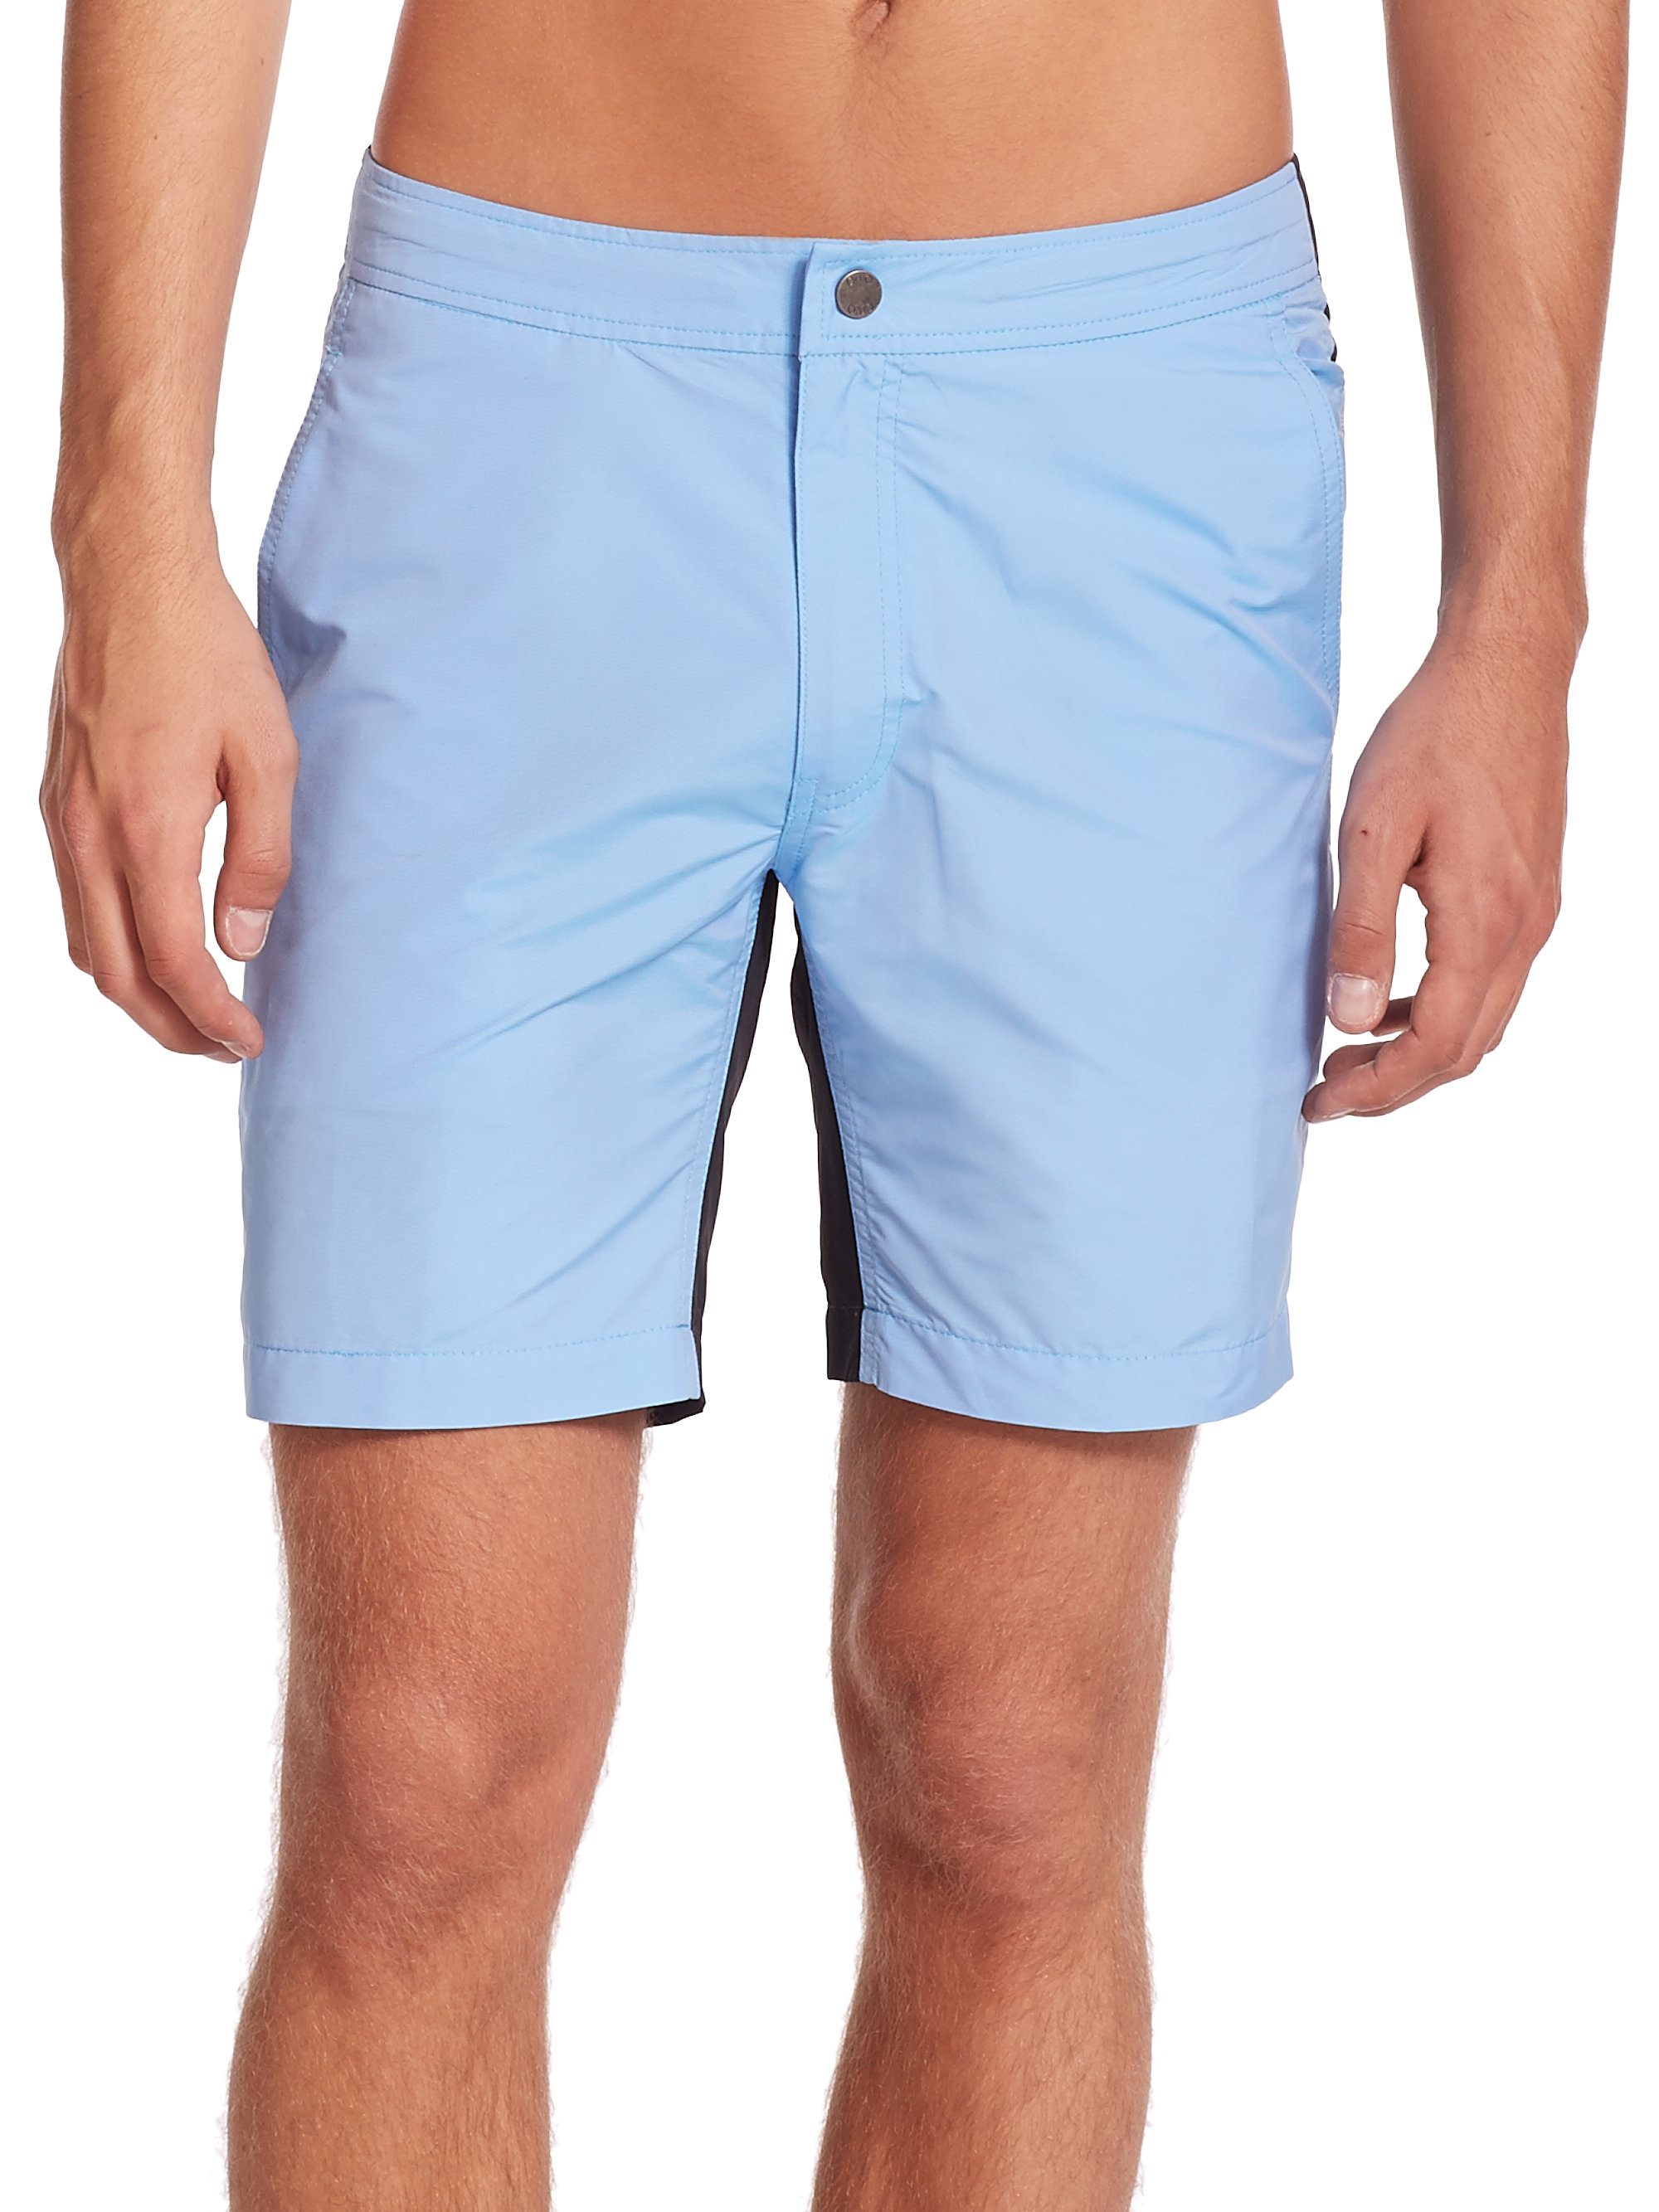 b5e4a3c0b8 Onia Calder Two-tone Swim Trunks in Blue for Men - Lyst